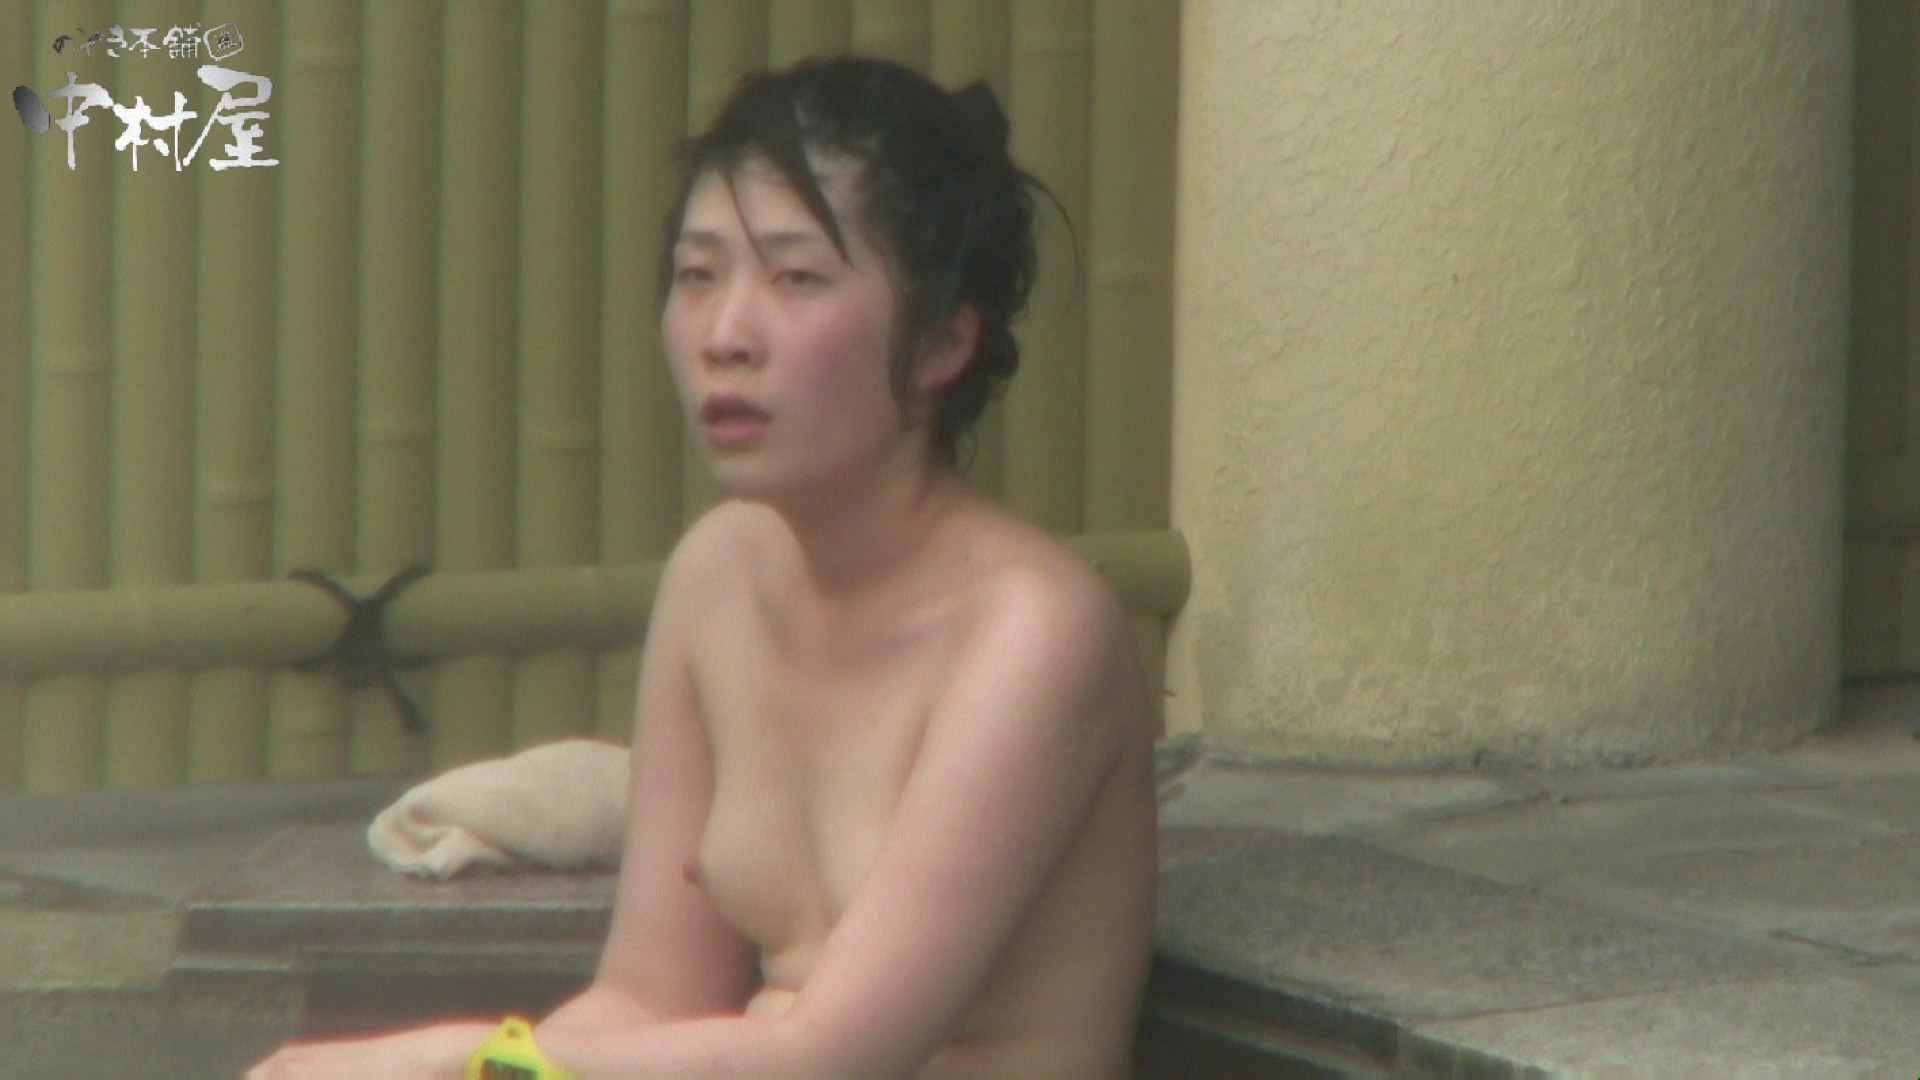 Aquaな露天風呂Vol.955 盗撮師作品   露天風呂突入  85pic 37